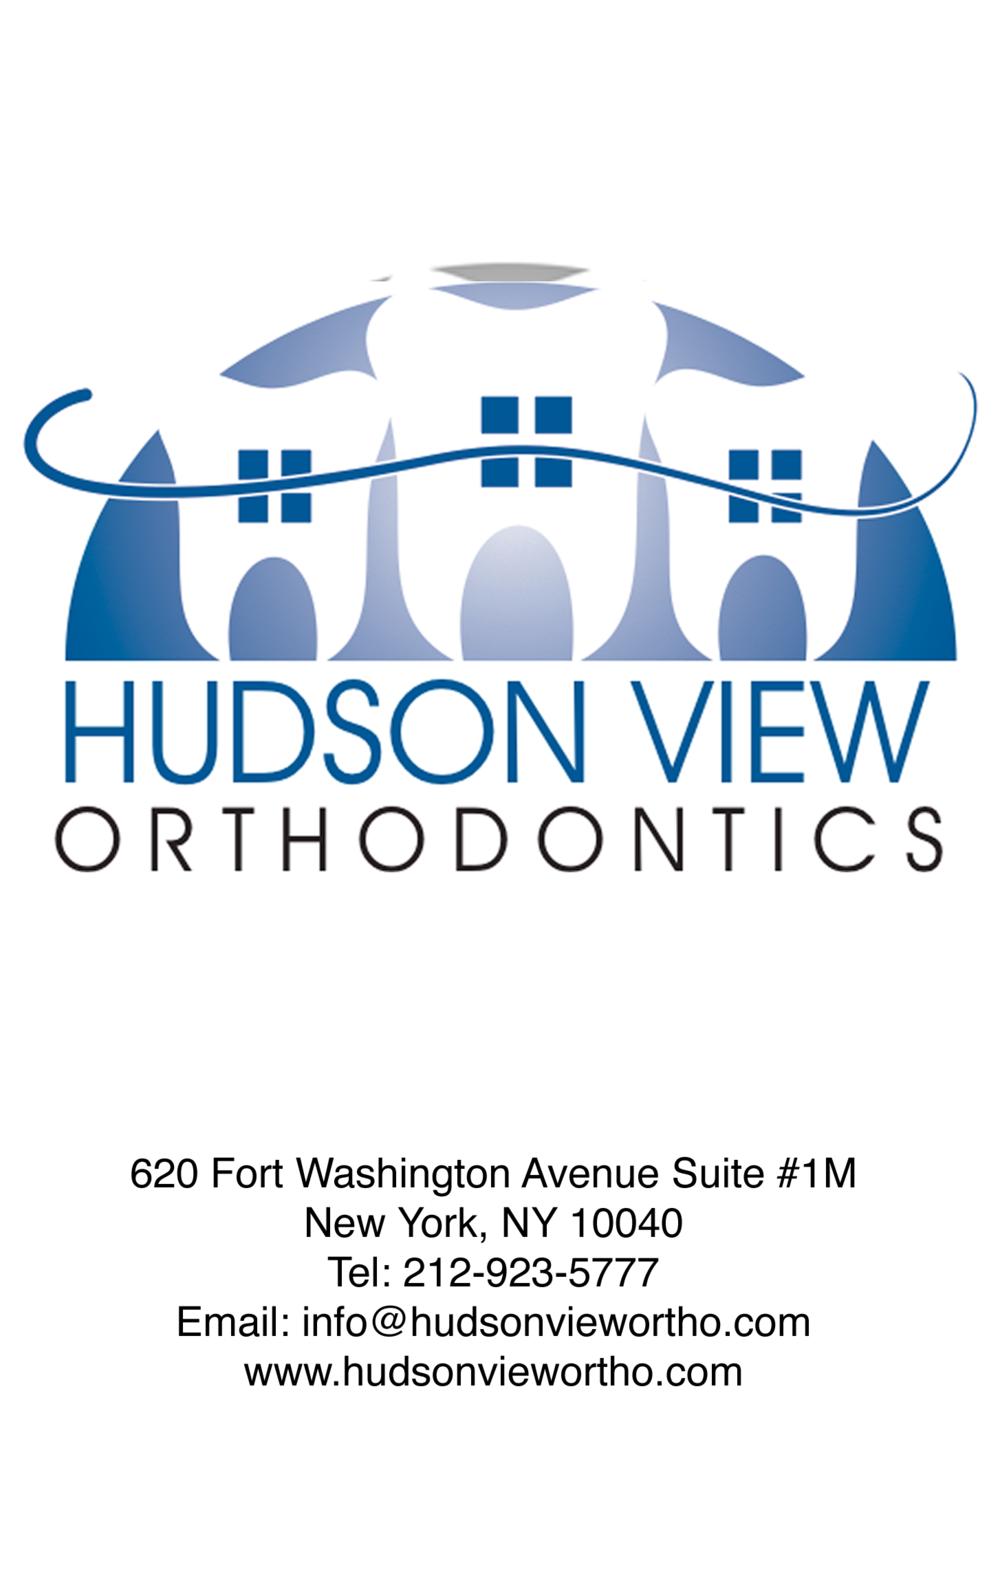 Hudson View Ortho